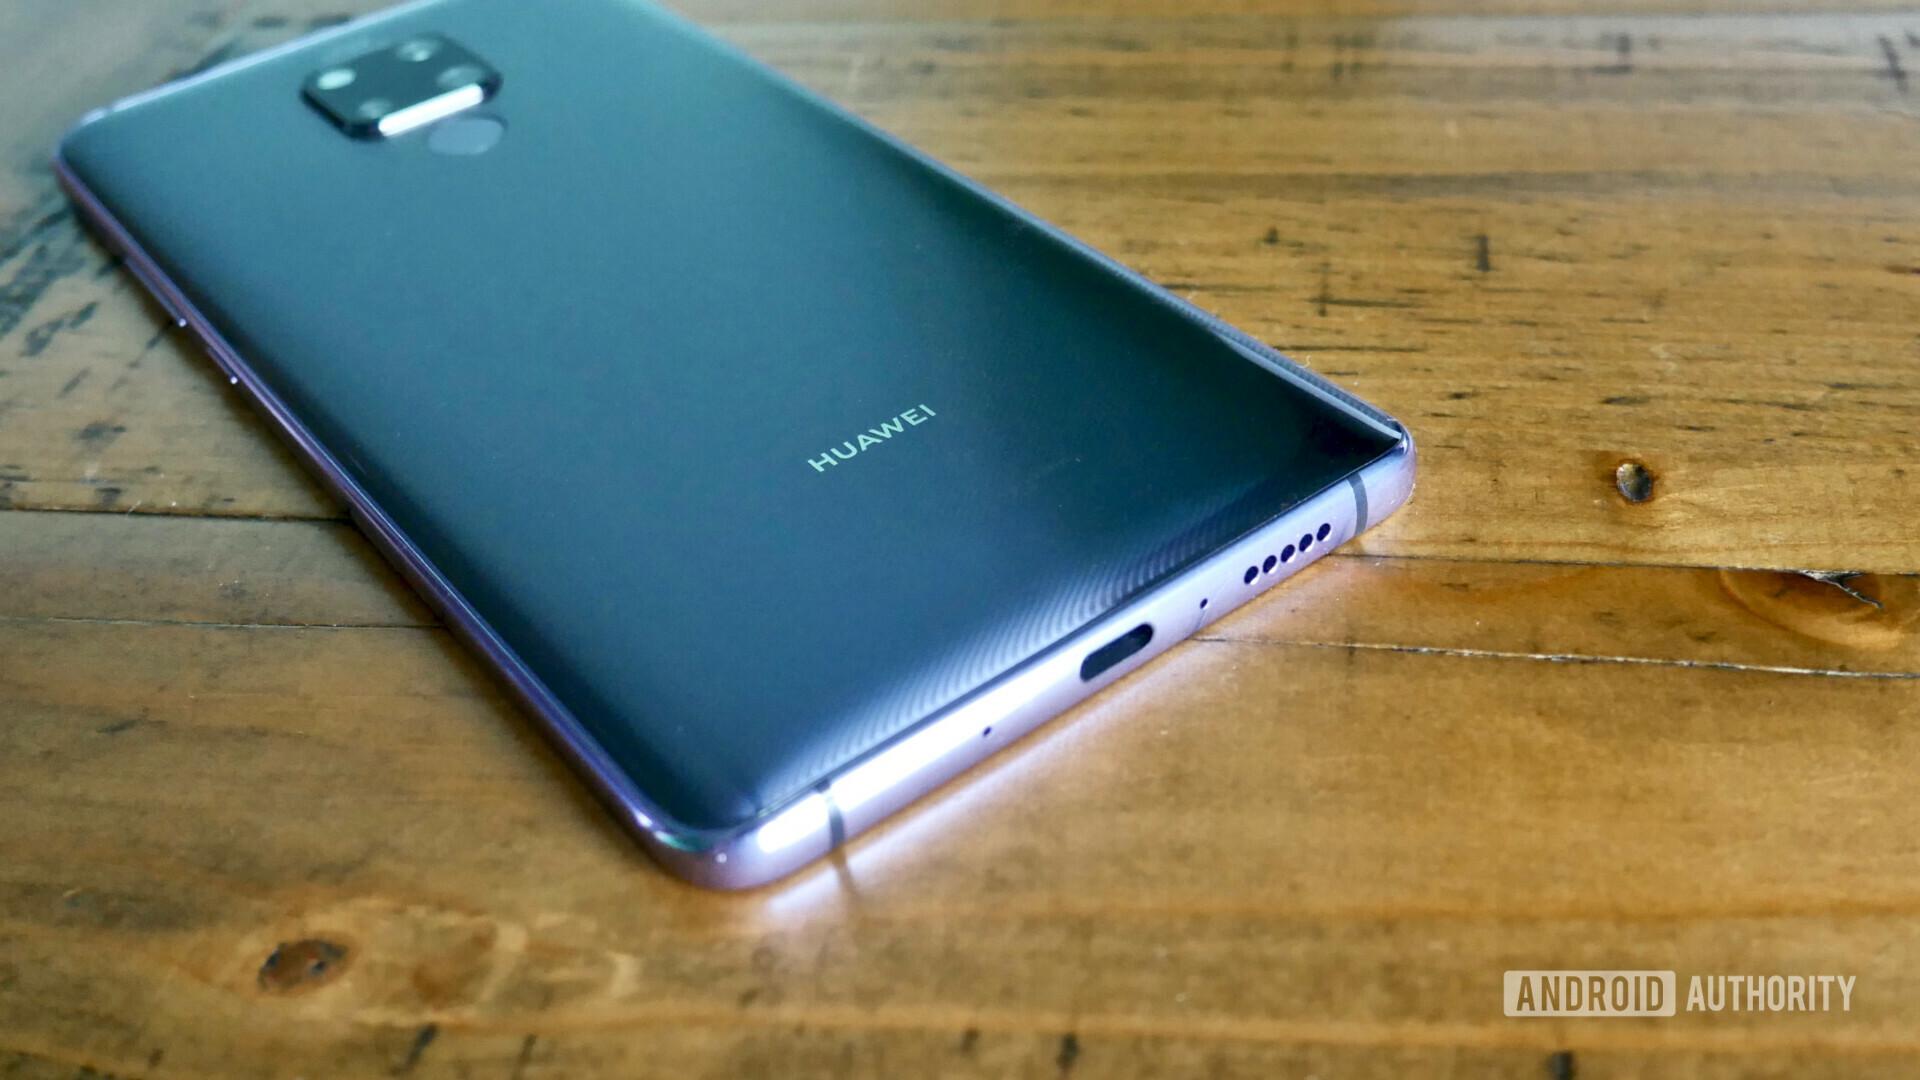 Huawei Mate 20 X review unit bottom